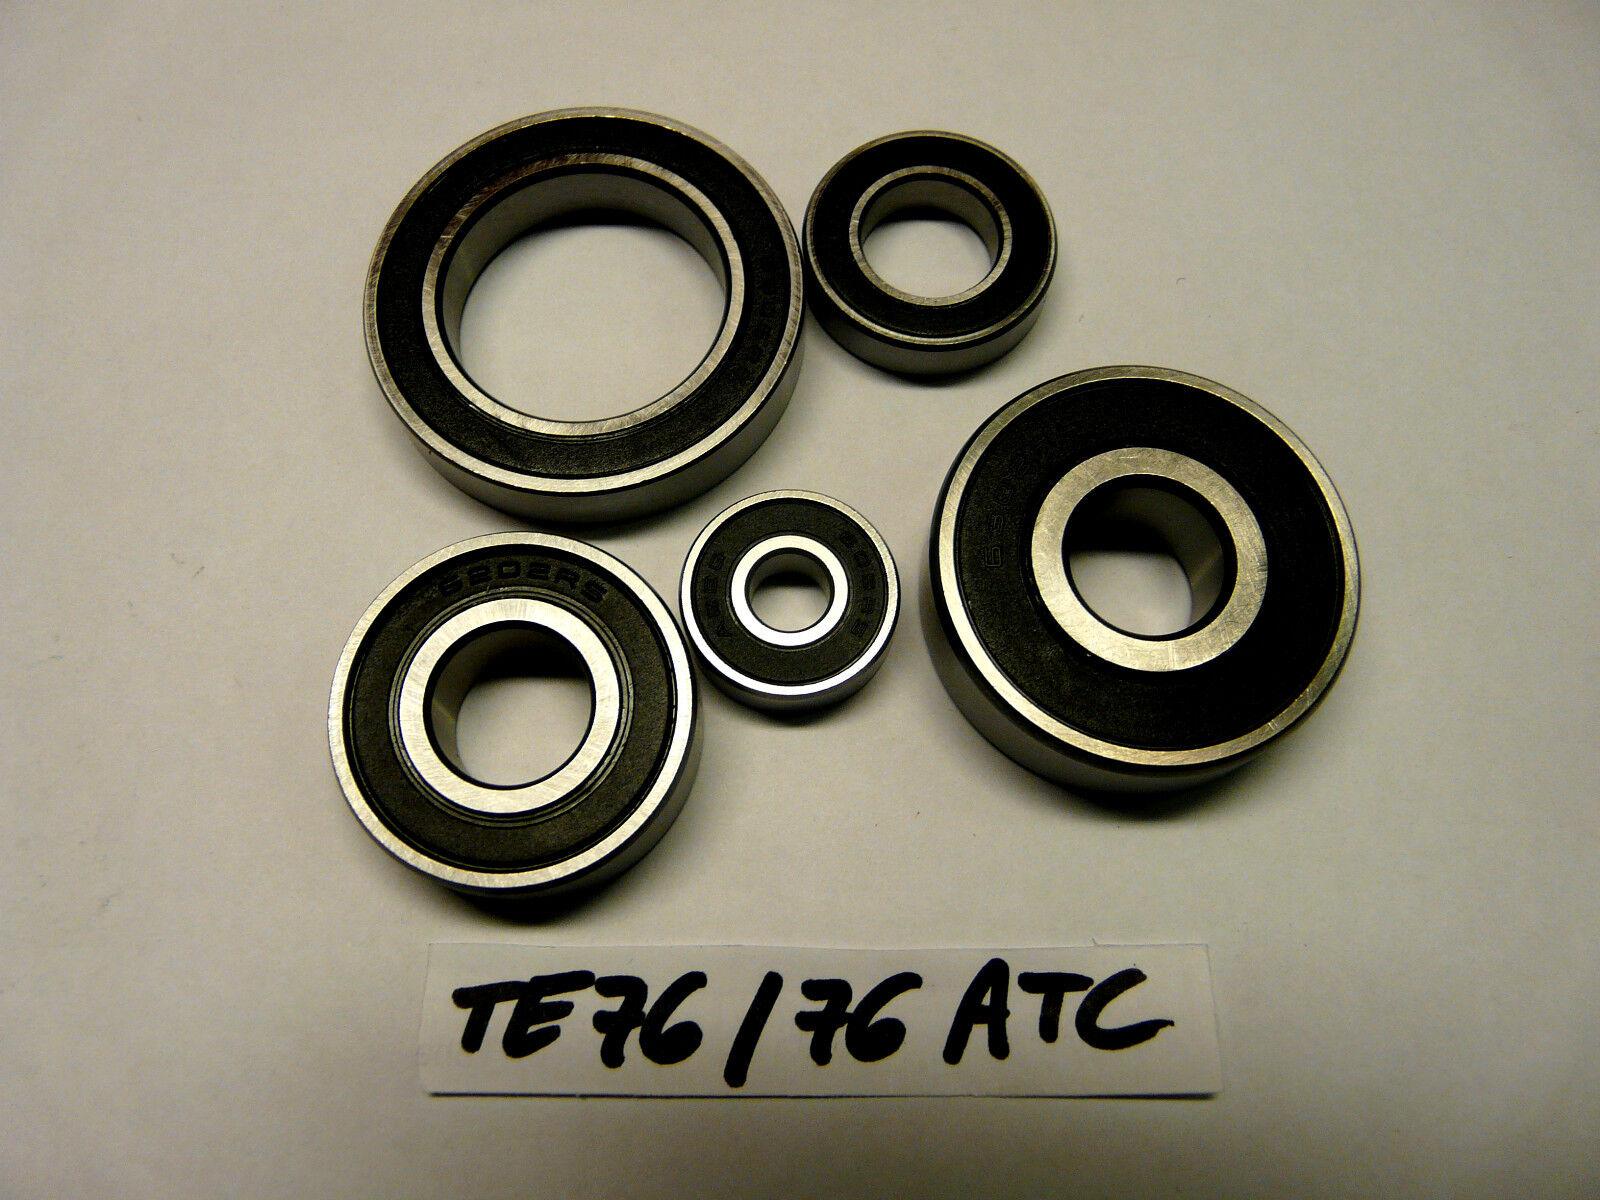 Hilti TE 76, TE 76 ATC, Kugellagersatz komplett